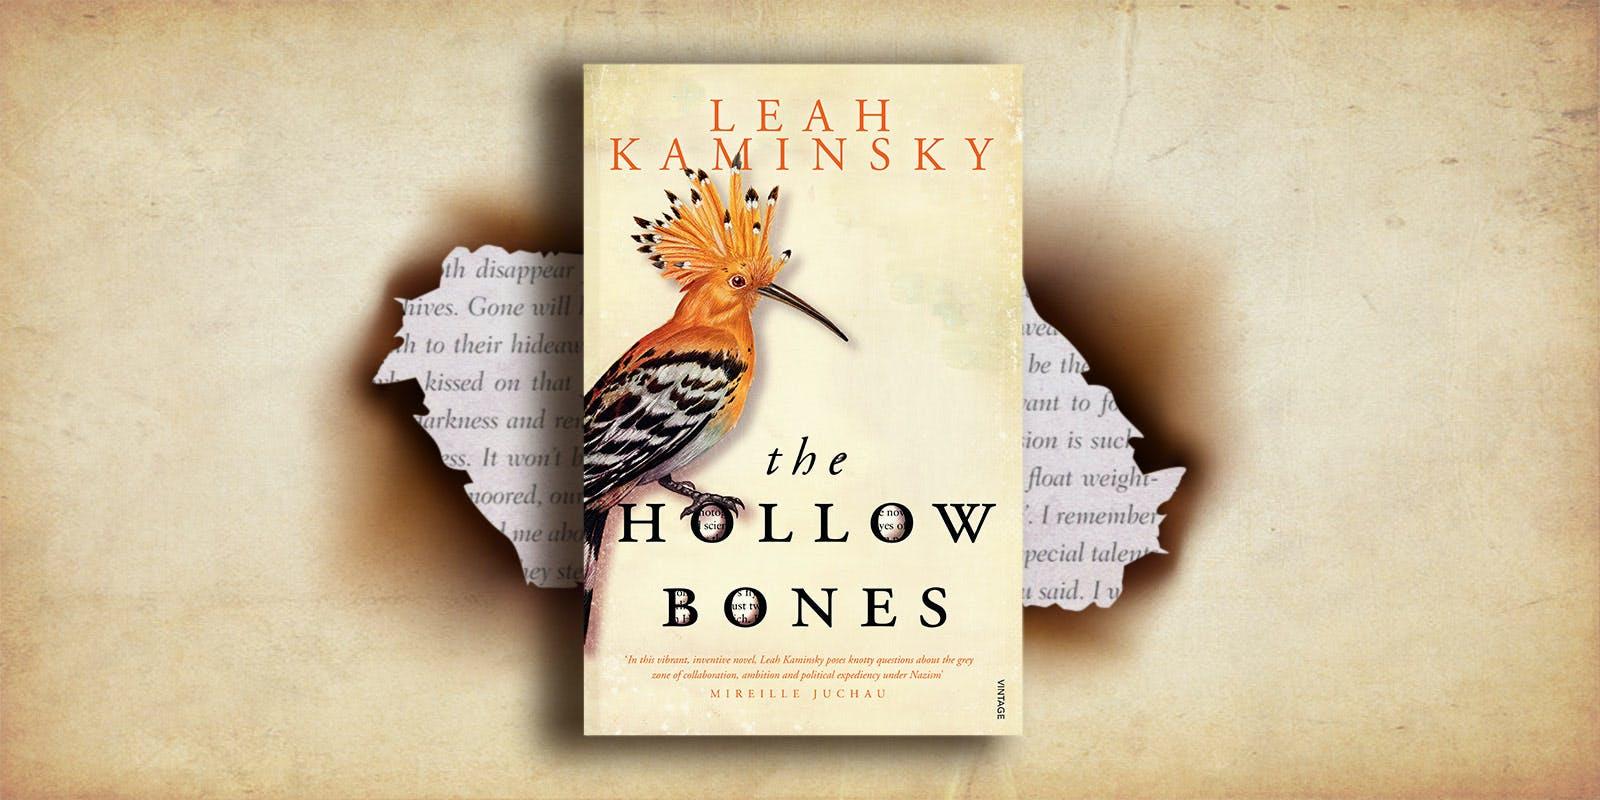 The Hollow Bones book club notes